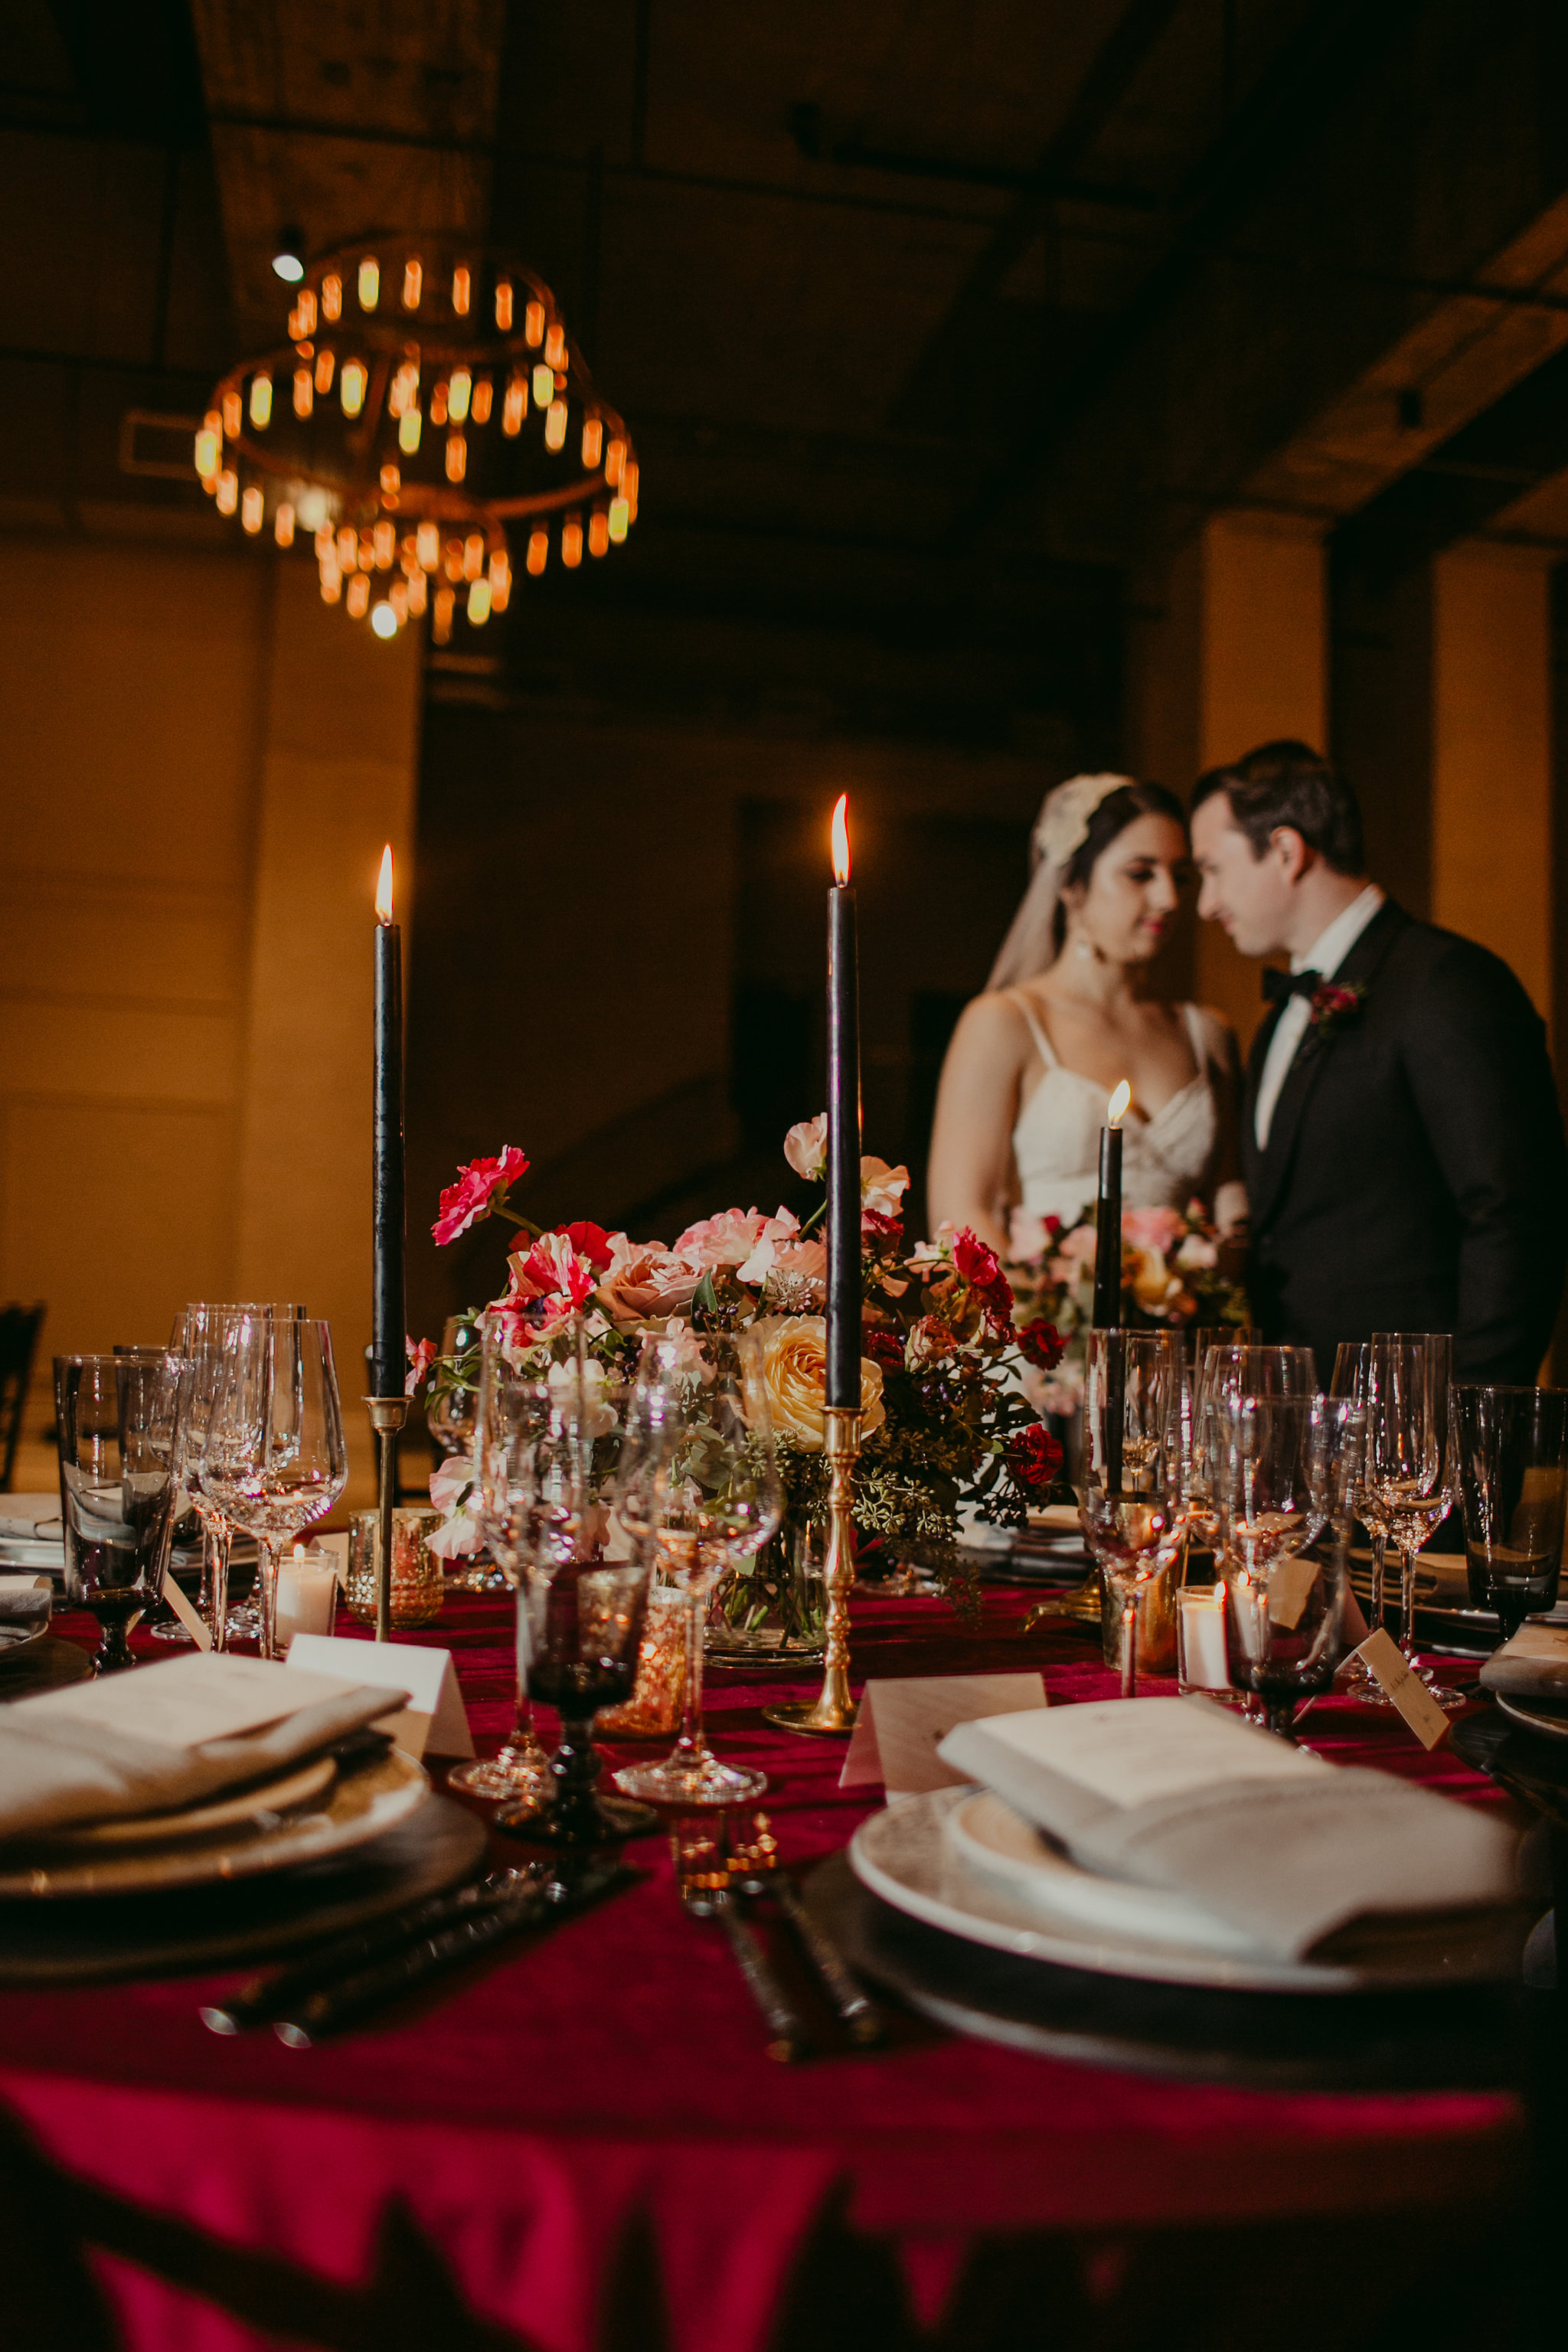 Williamsburg_Hotel_Wedding_Photographer_Chellise_Michael_Photography-281.jpg